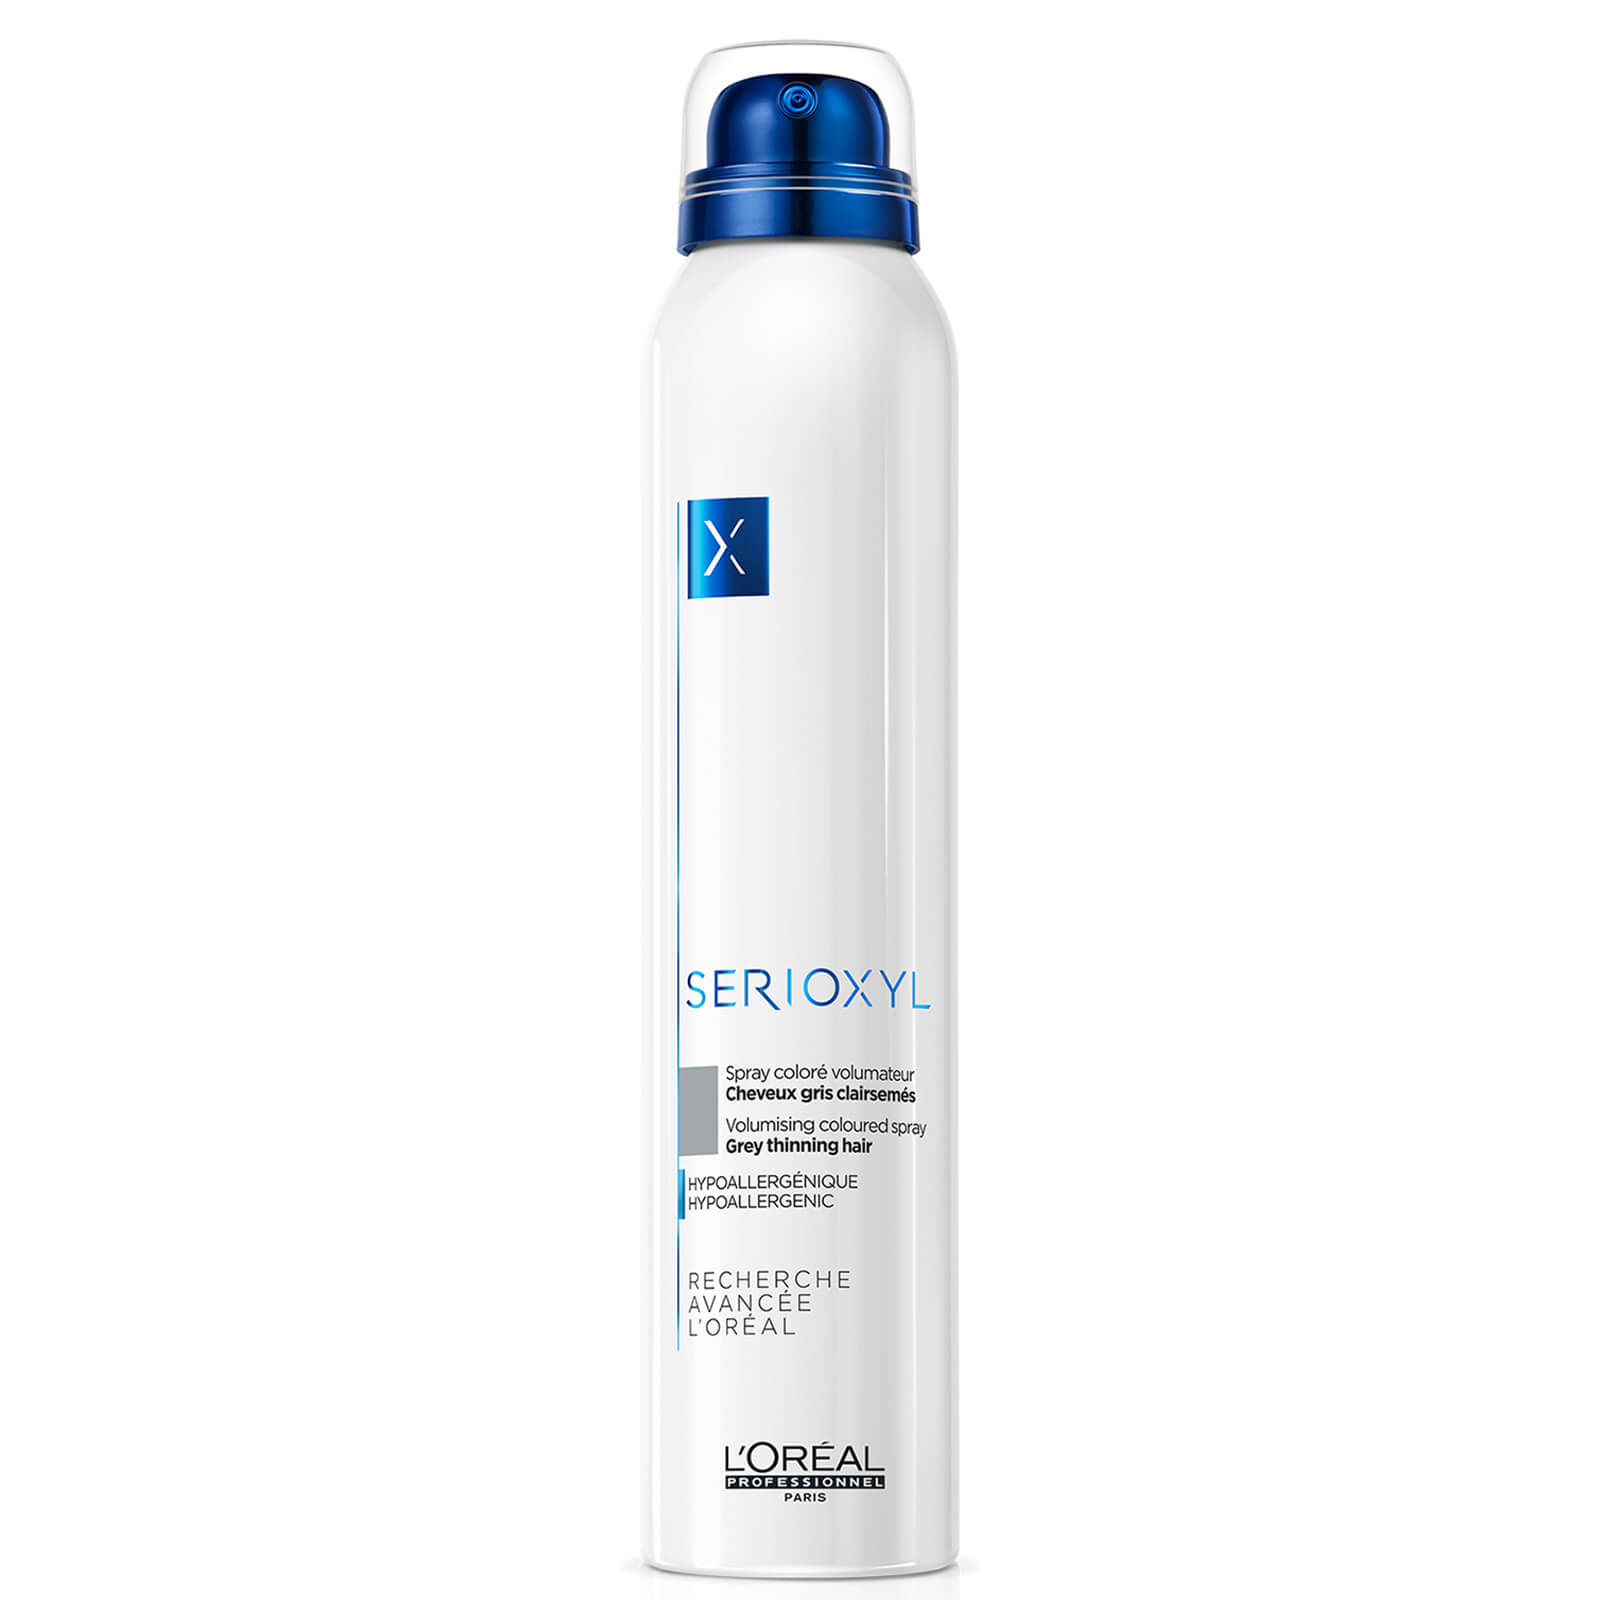 L'Oréal Professionnel Serioxyl Volumising Hair Fibre Spray - Grey 250ml